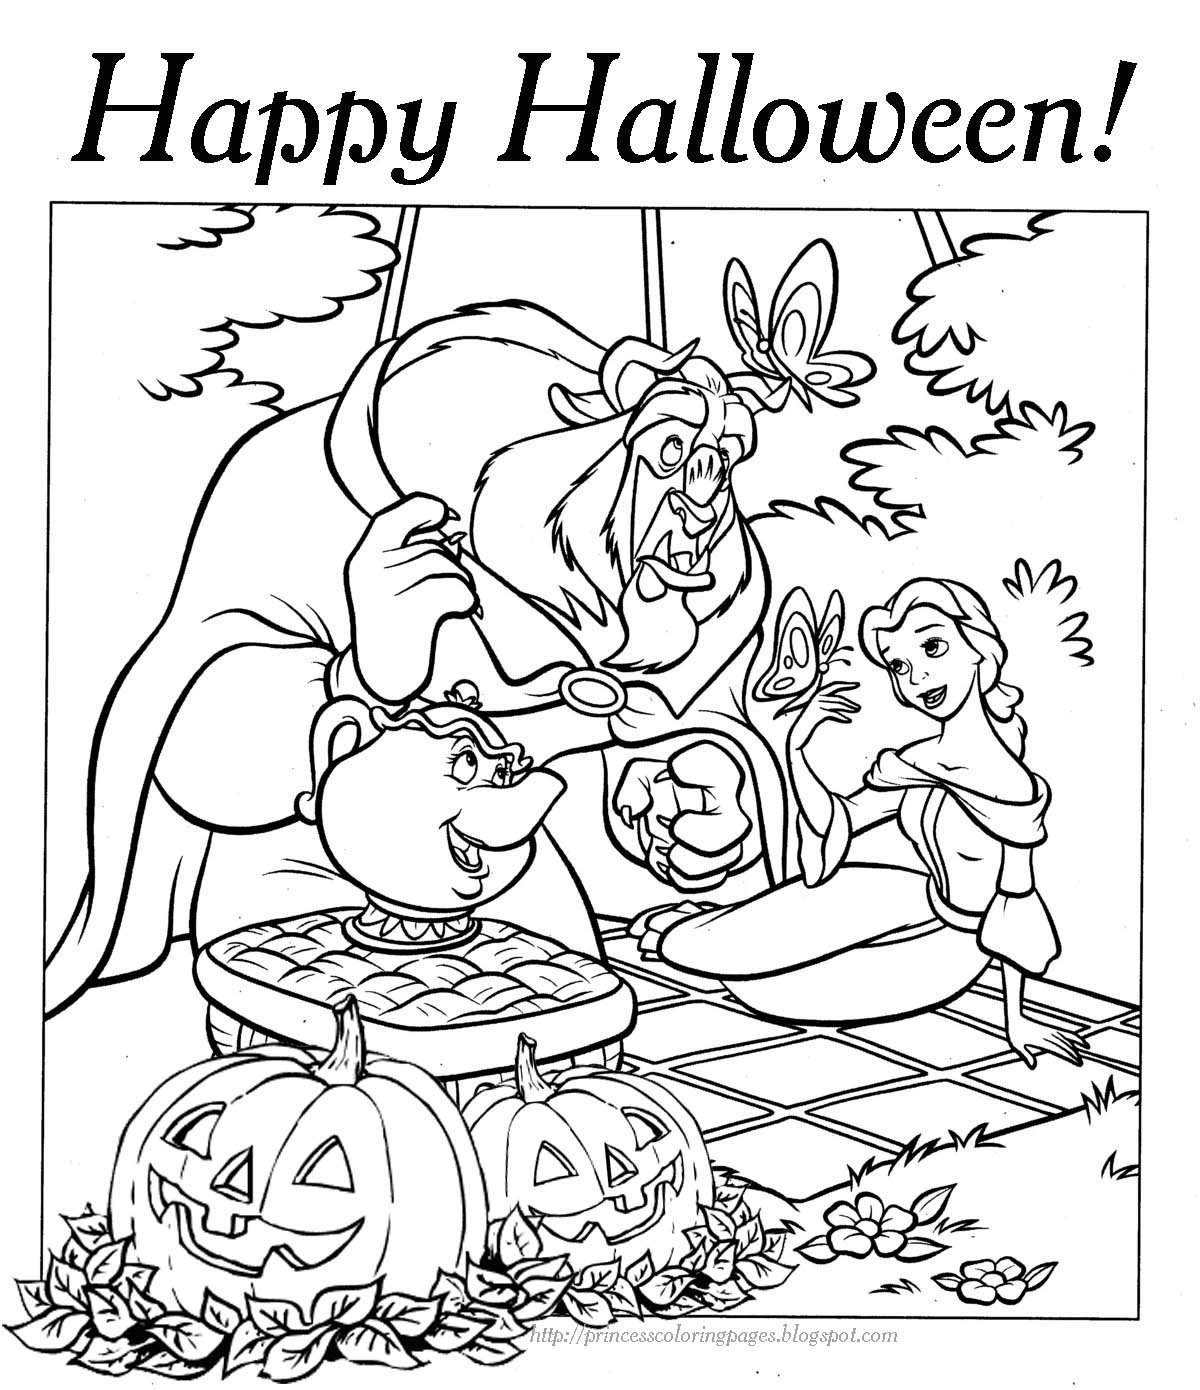 Halloween Coloring Page Princess Belle Disney